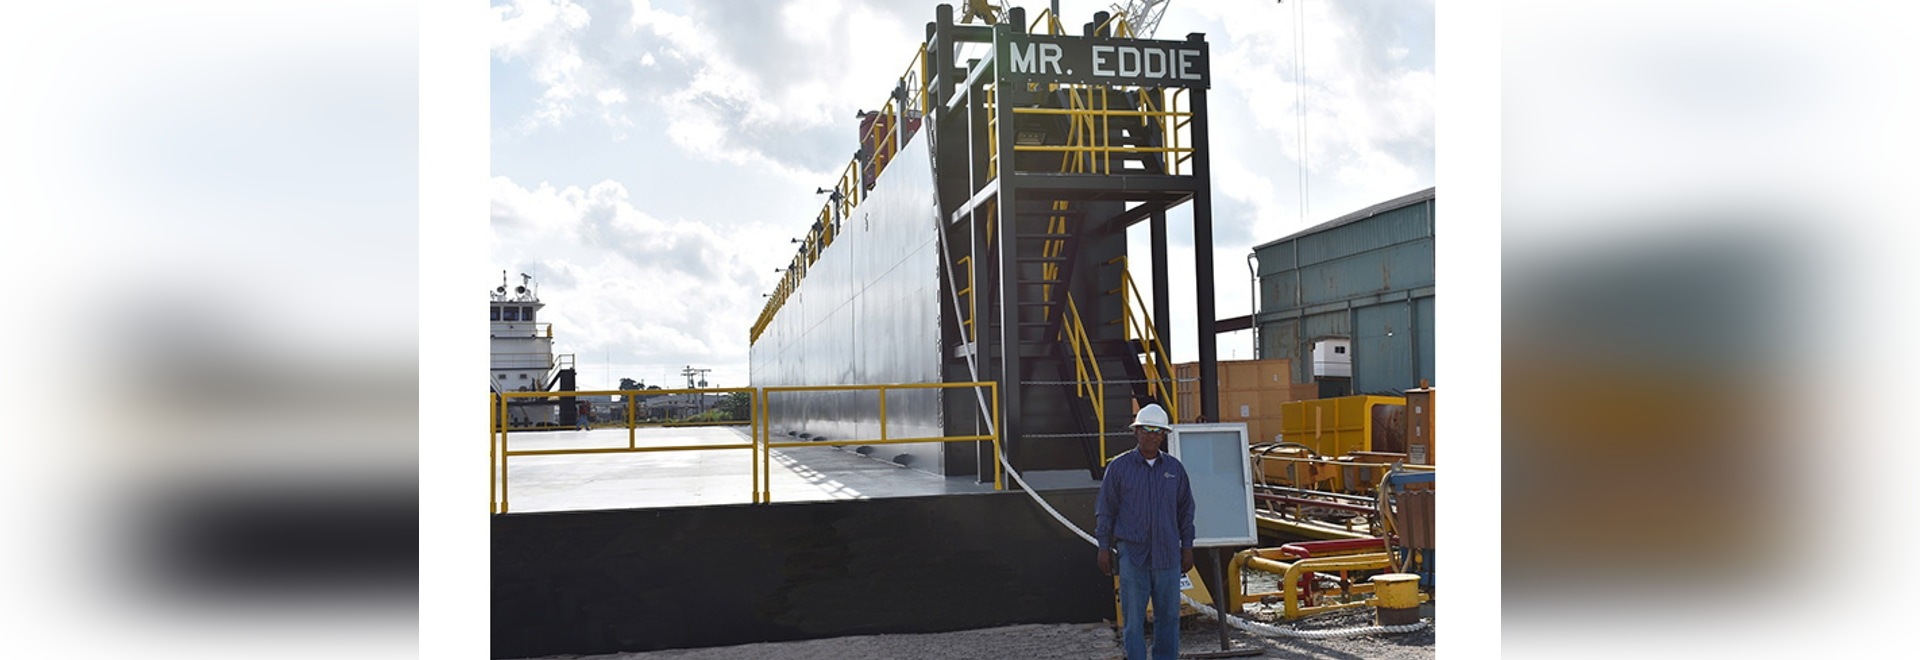 "Eddie Barnes, Jr., namesake for new dry-dock at Bollinger Quick Repair, Harvey, La. stands proudly in front of the ""Mr. Eddie"""